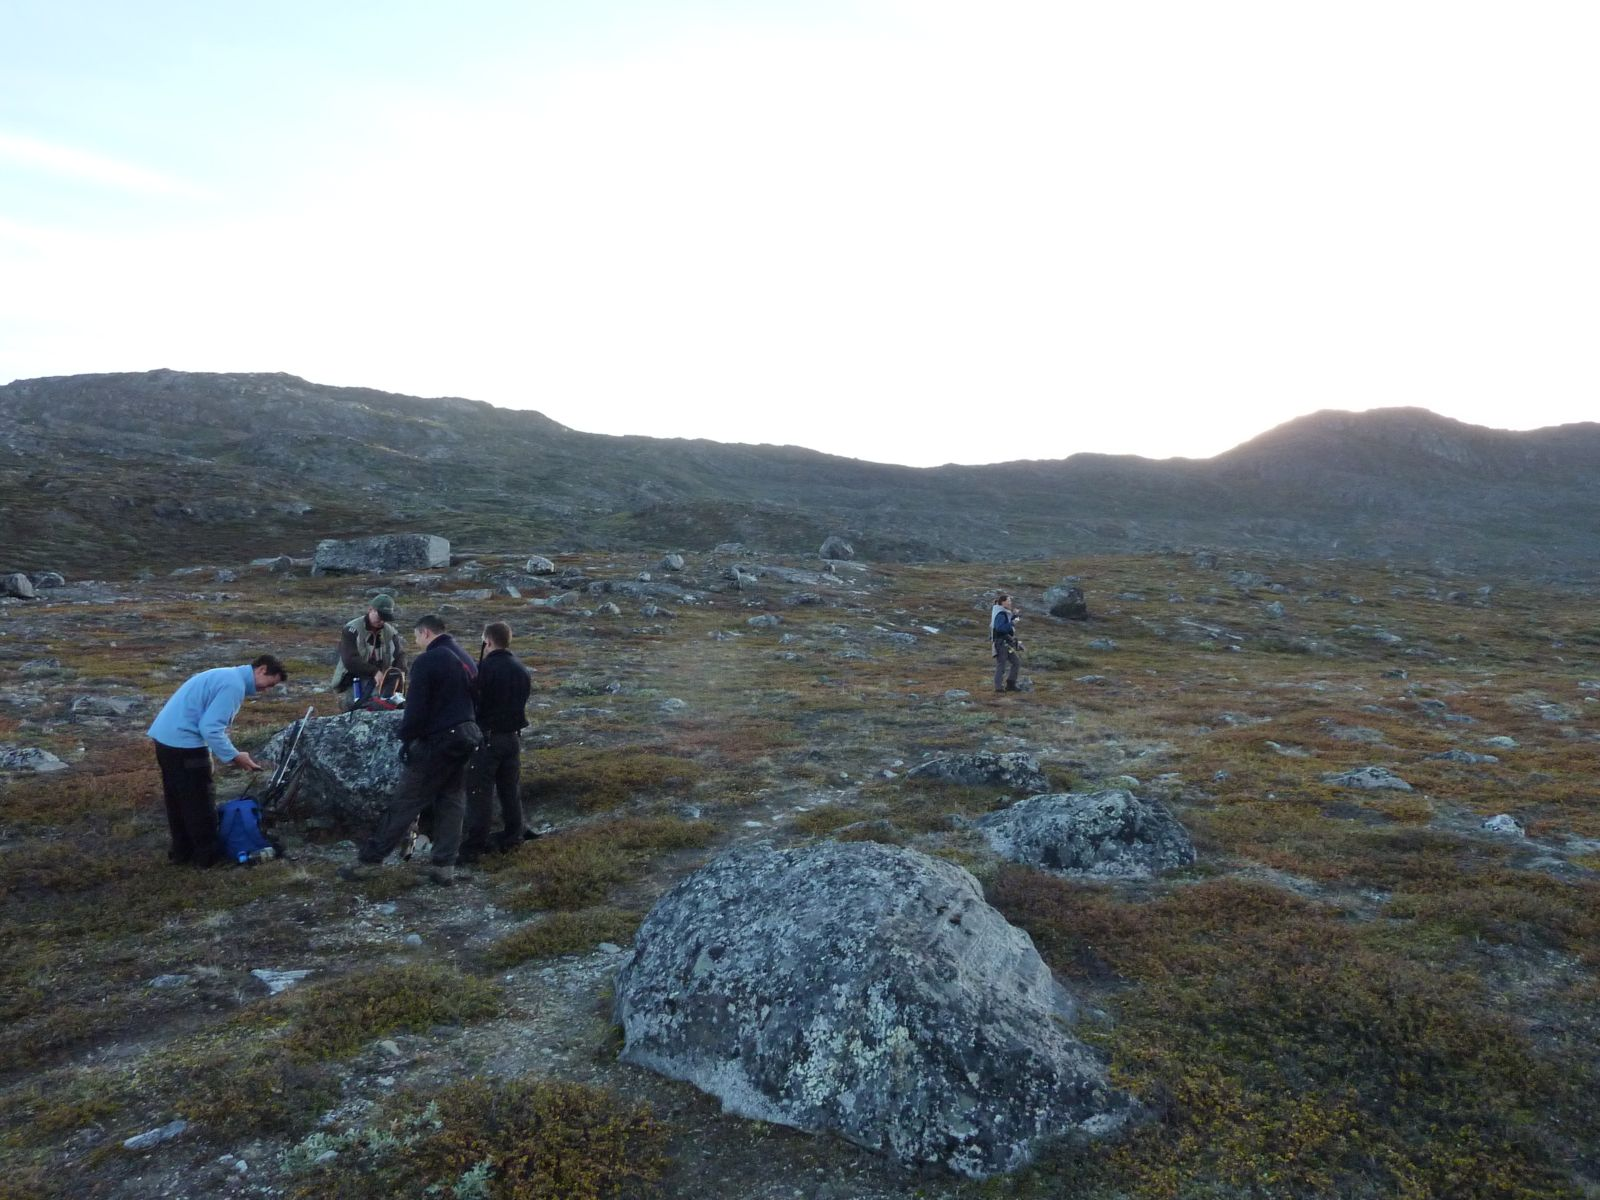 2010-09-04-0735_-_Carlo; Henrik Steinbacher; Jesper Eugenius Labansen; John Telling; Nuka Klausen Telling